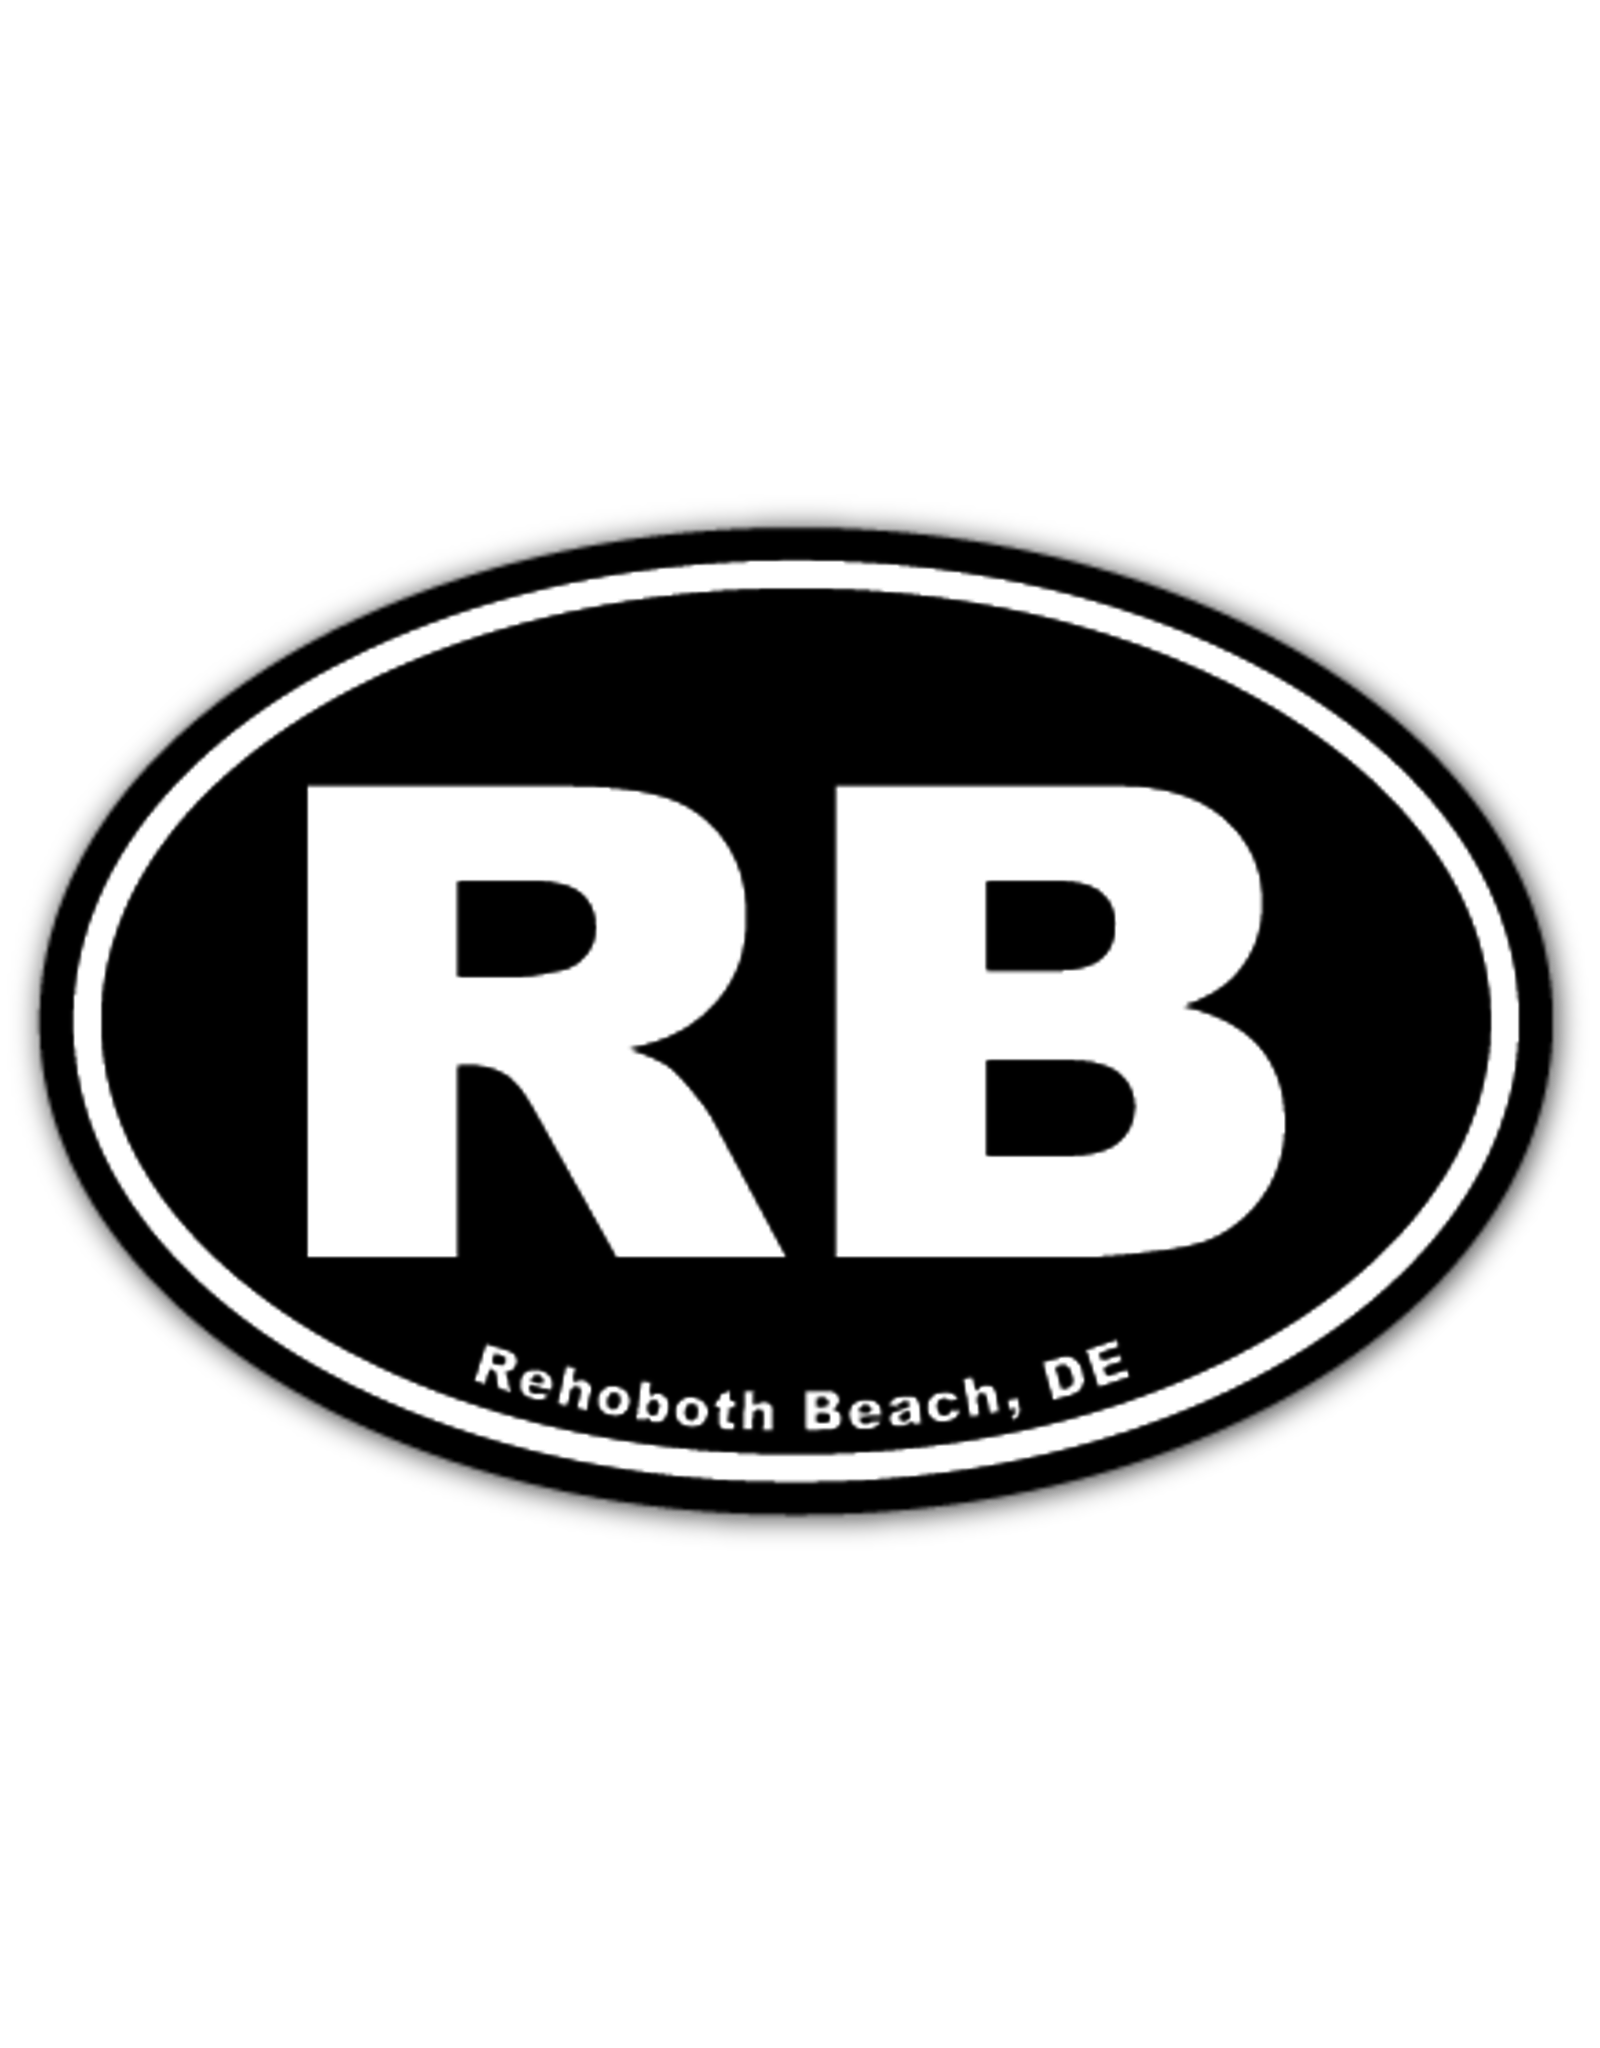 REHOBOTH LIFESTYLE EURO STICKER 5.75 x 3.875 OVAL REHOBOTH BEACH BLACK